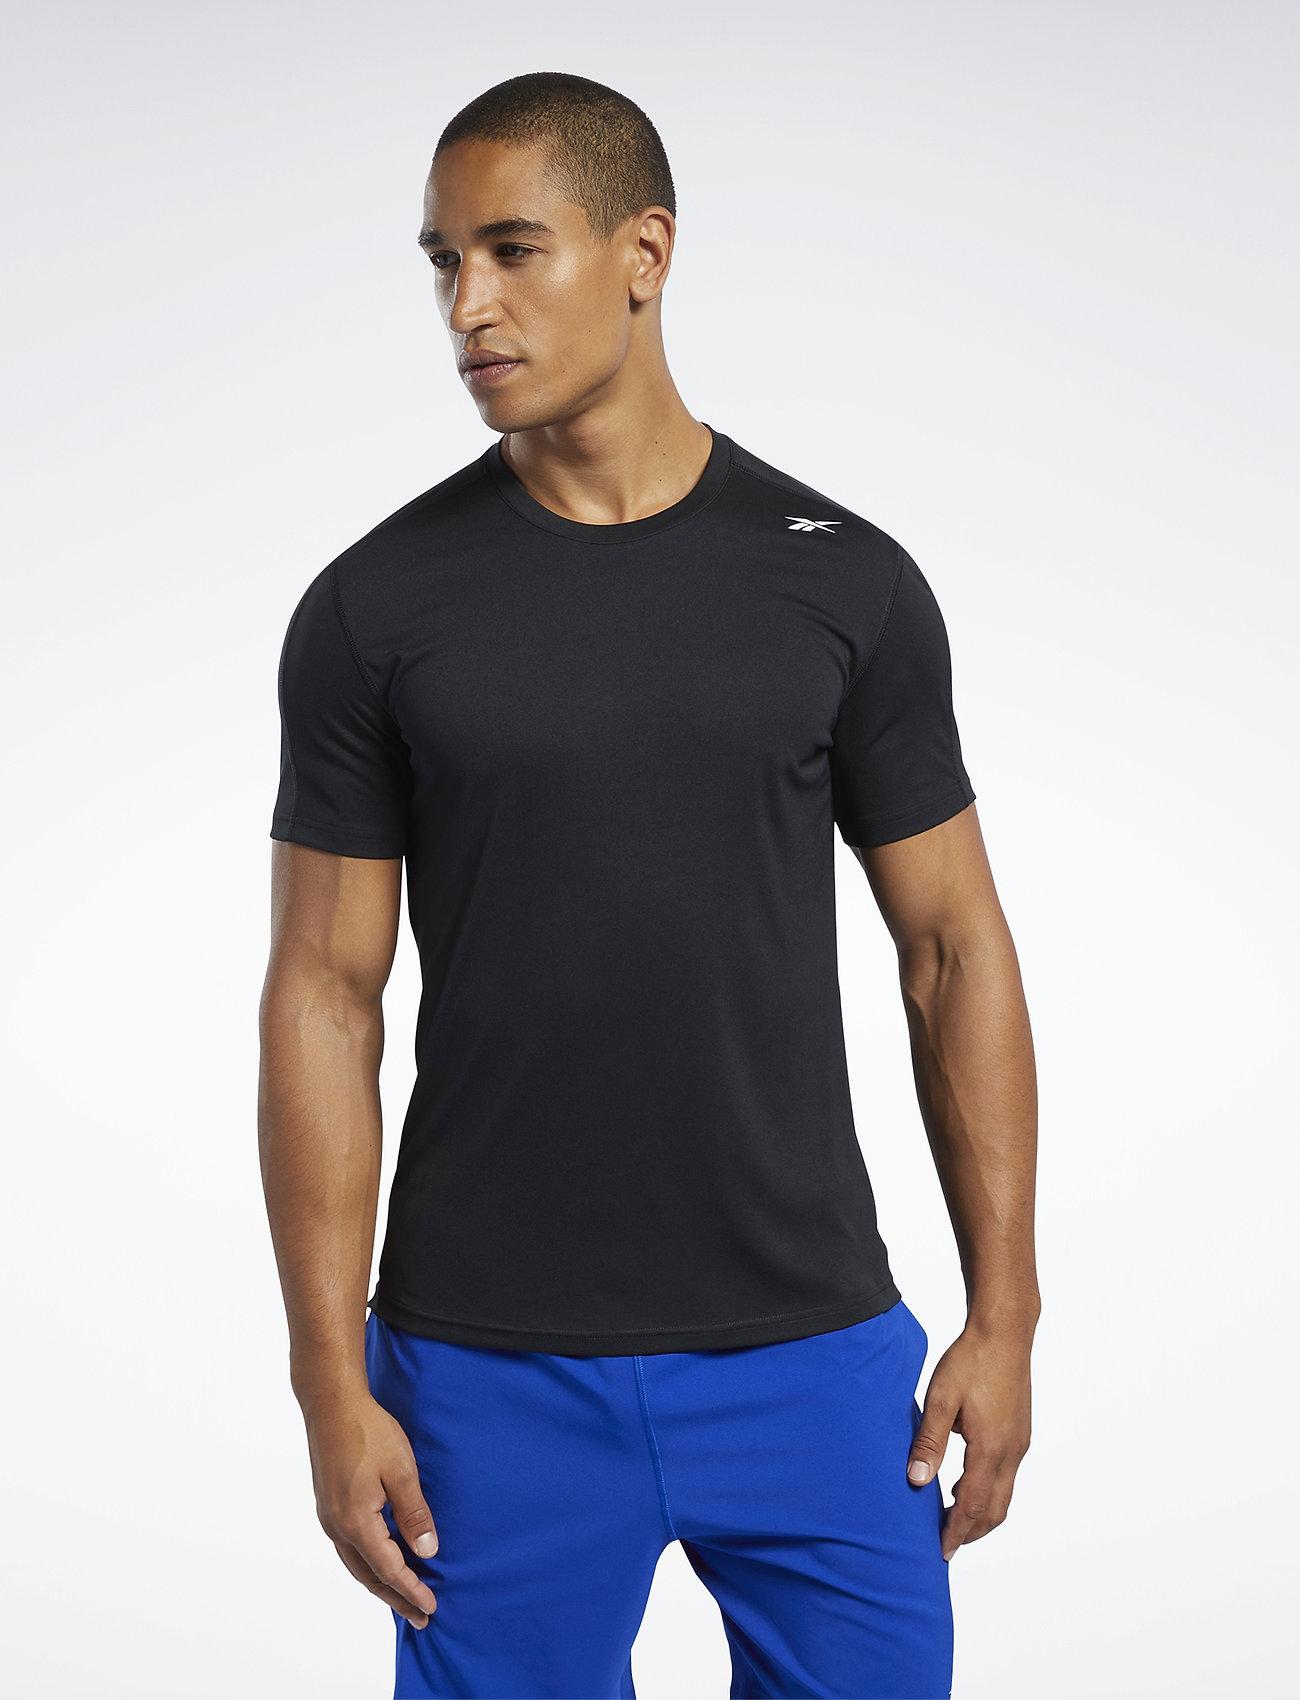 Reebok Performance WOR COMM SS TECH TEE - T-shirts BLACK sN4j96Bz